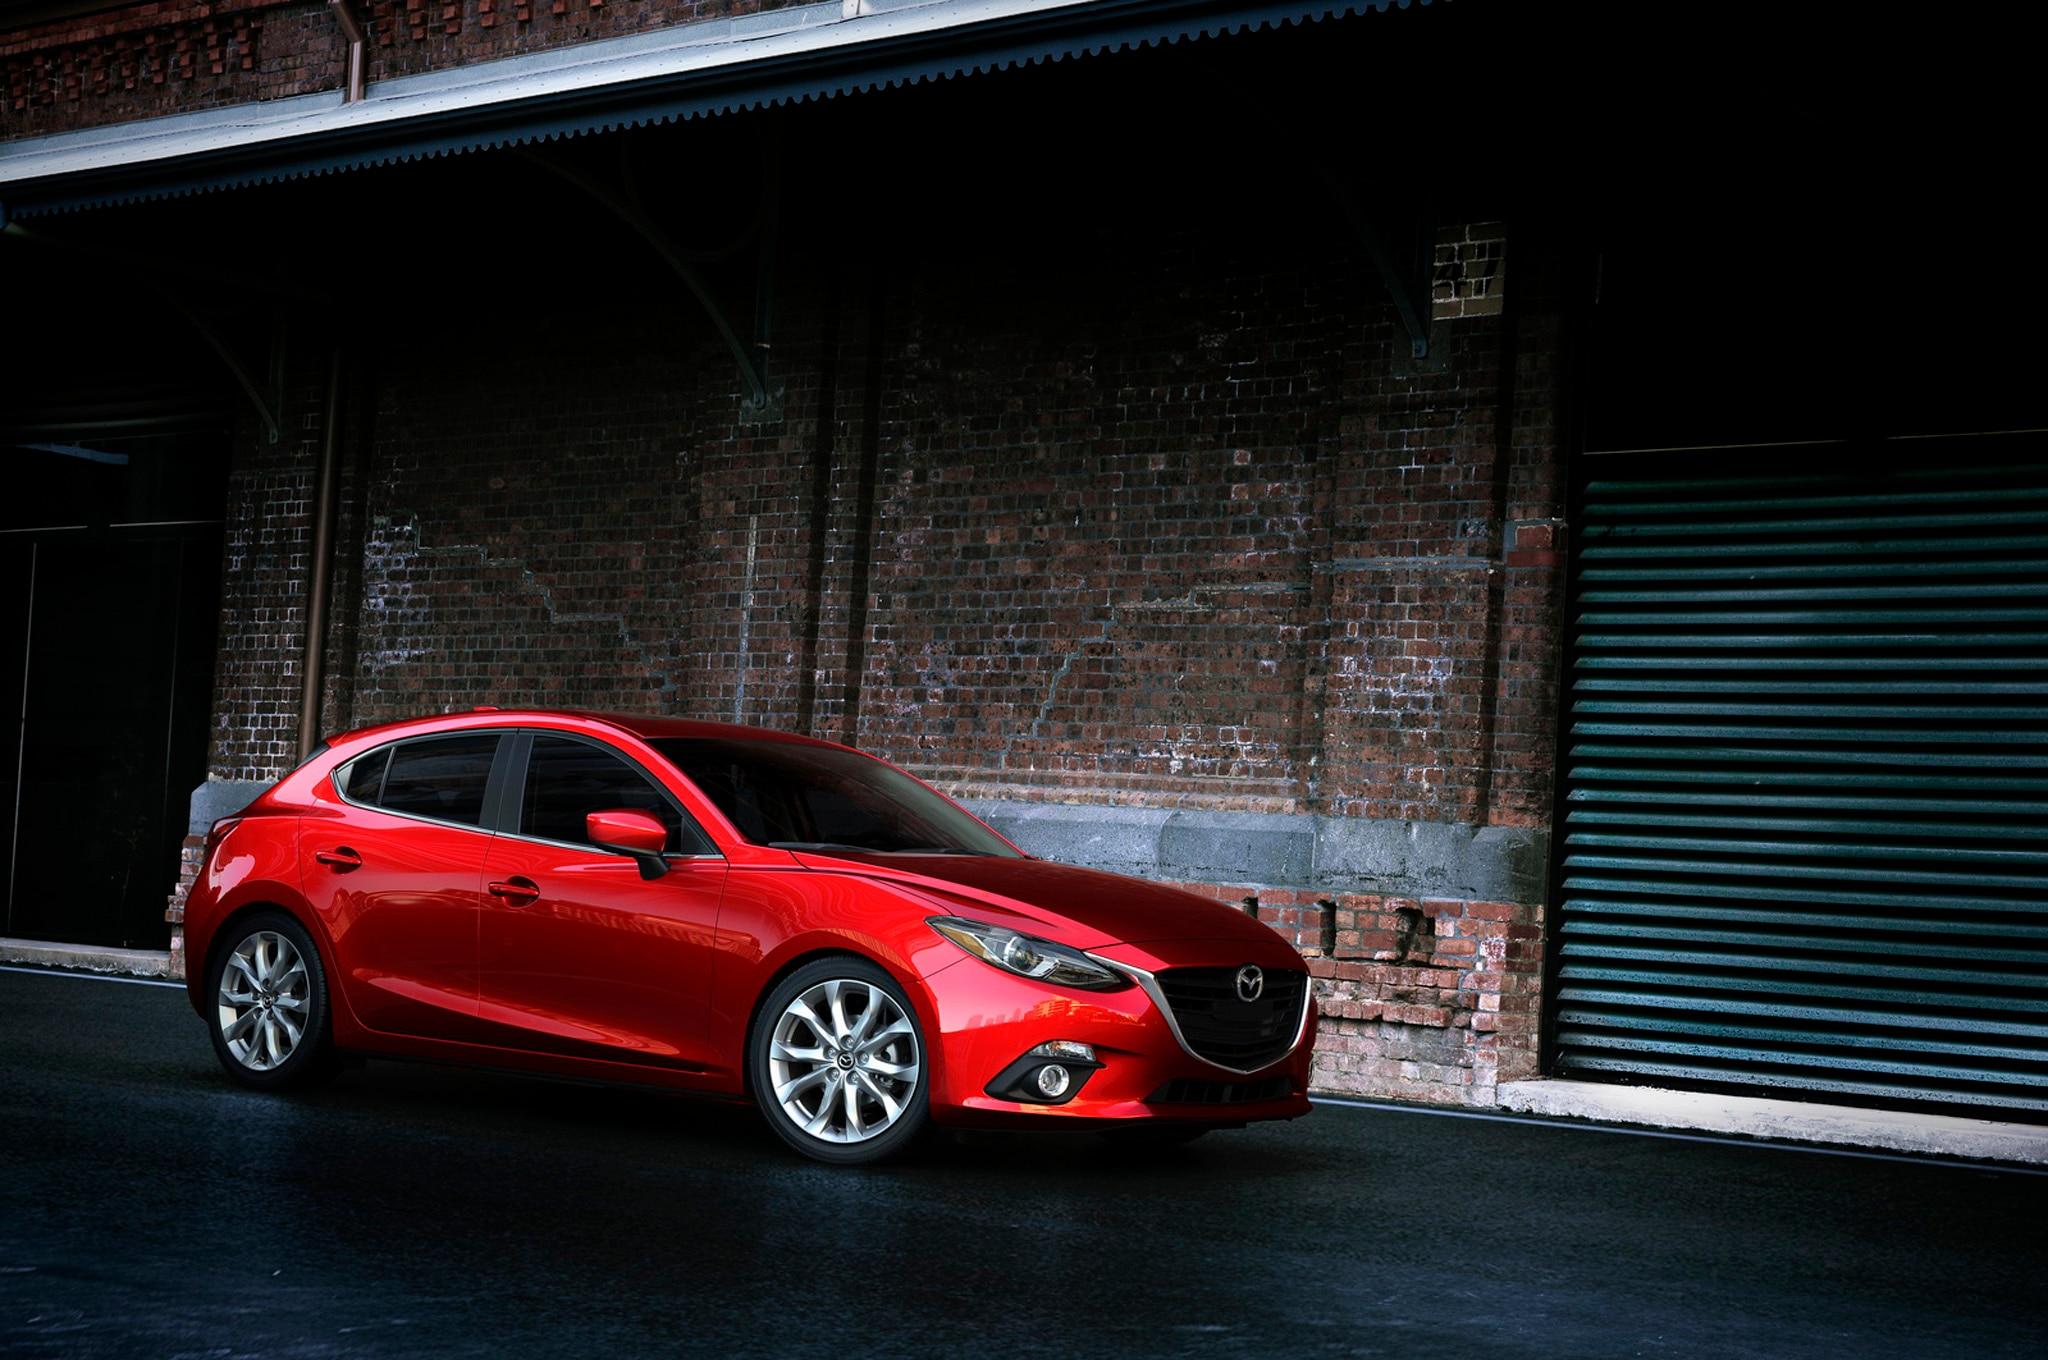 2014 Mazda 3 Front Three Quarter 11